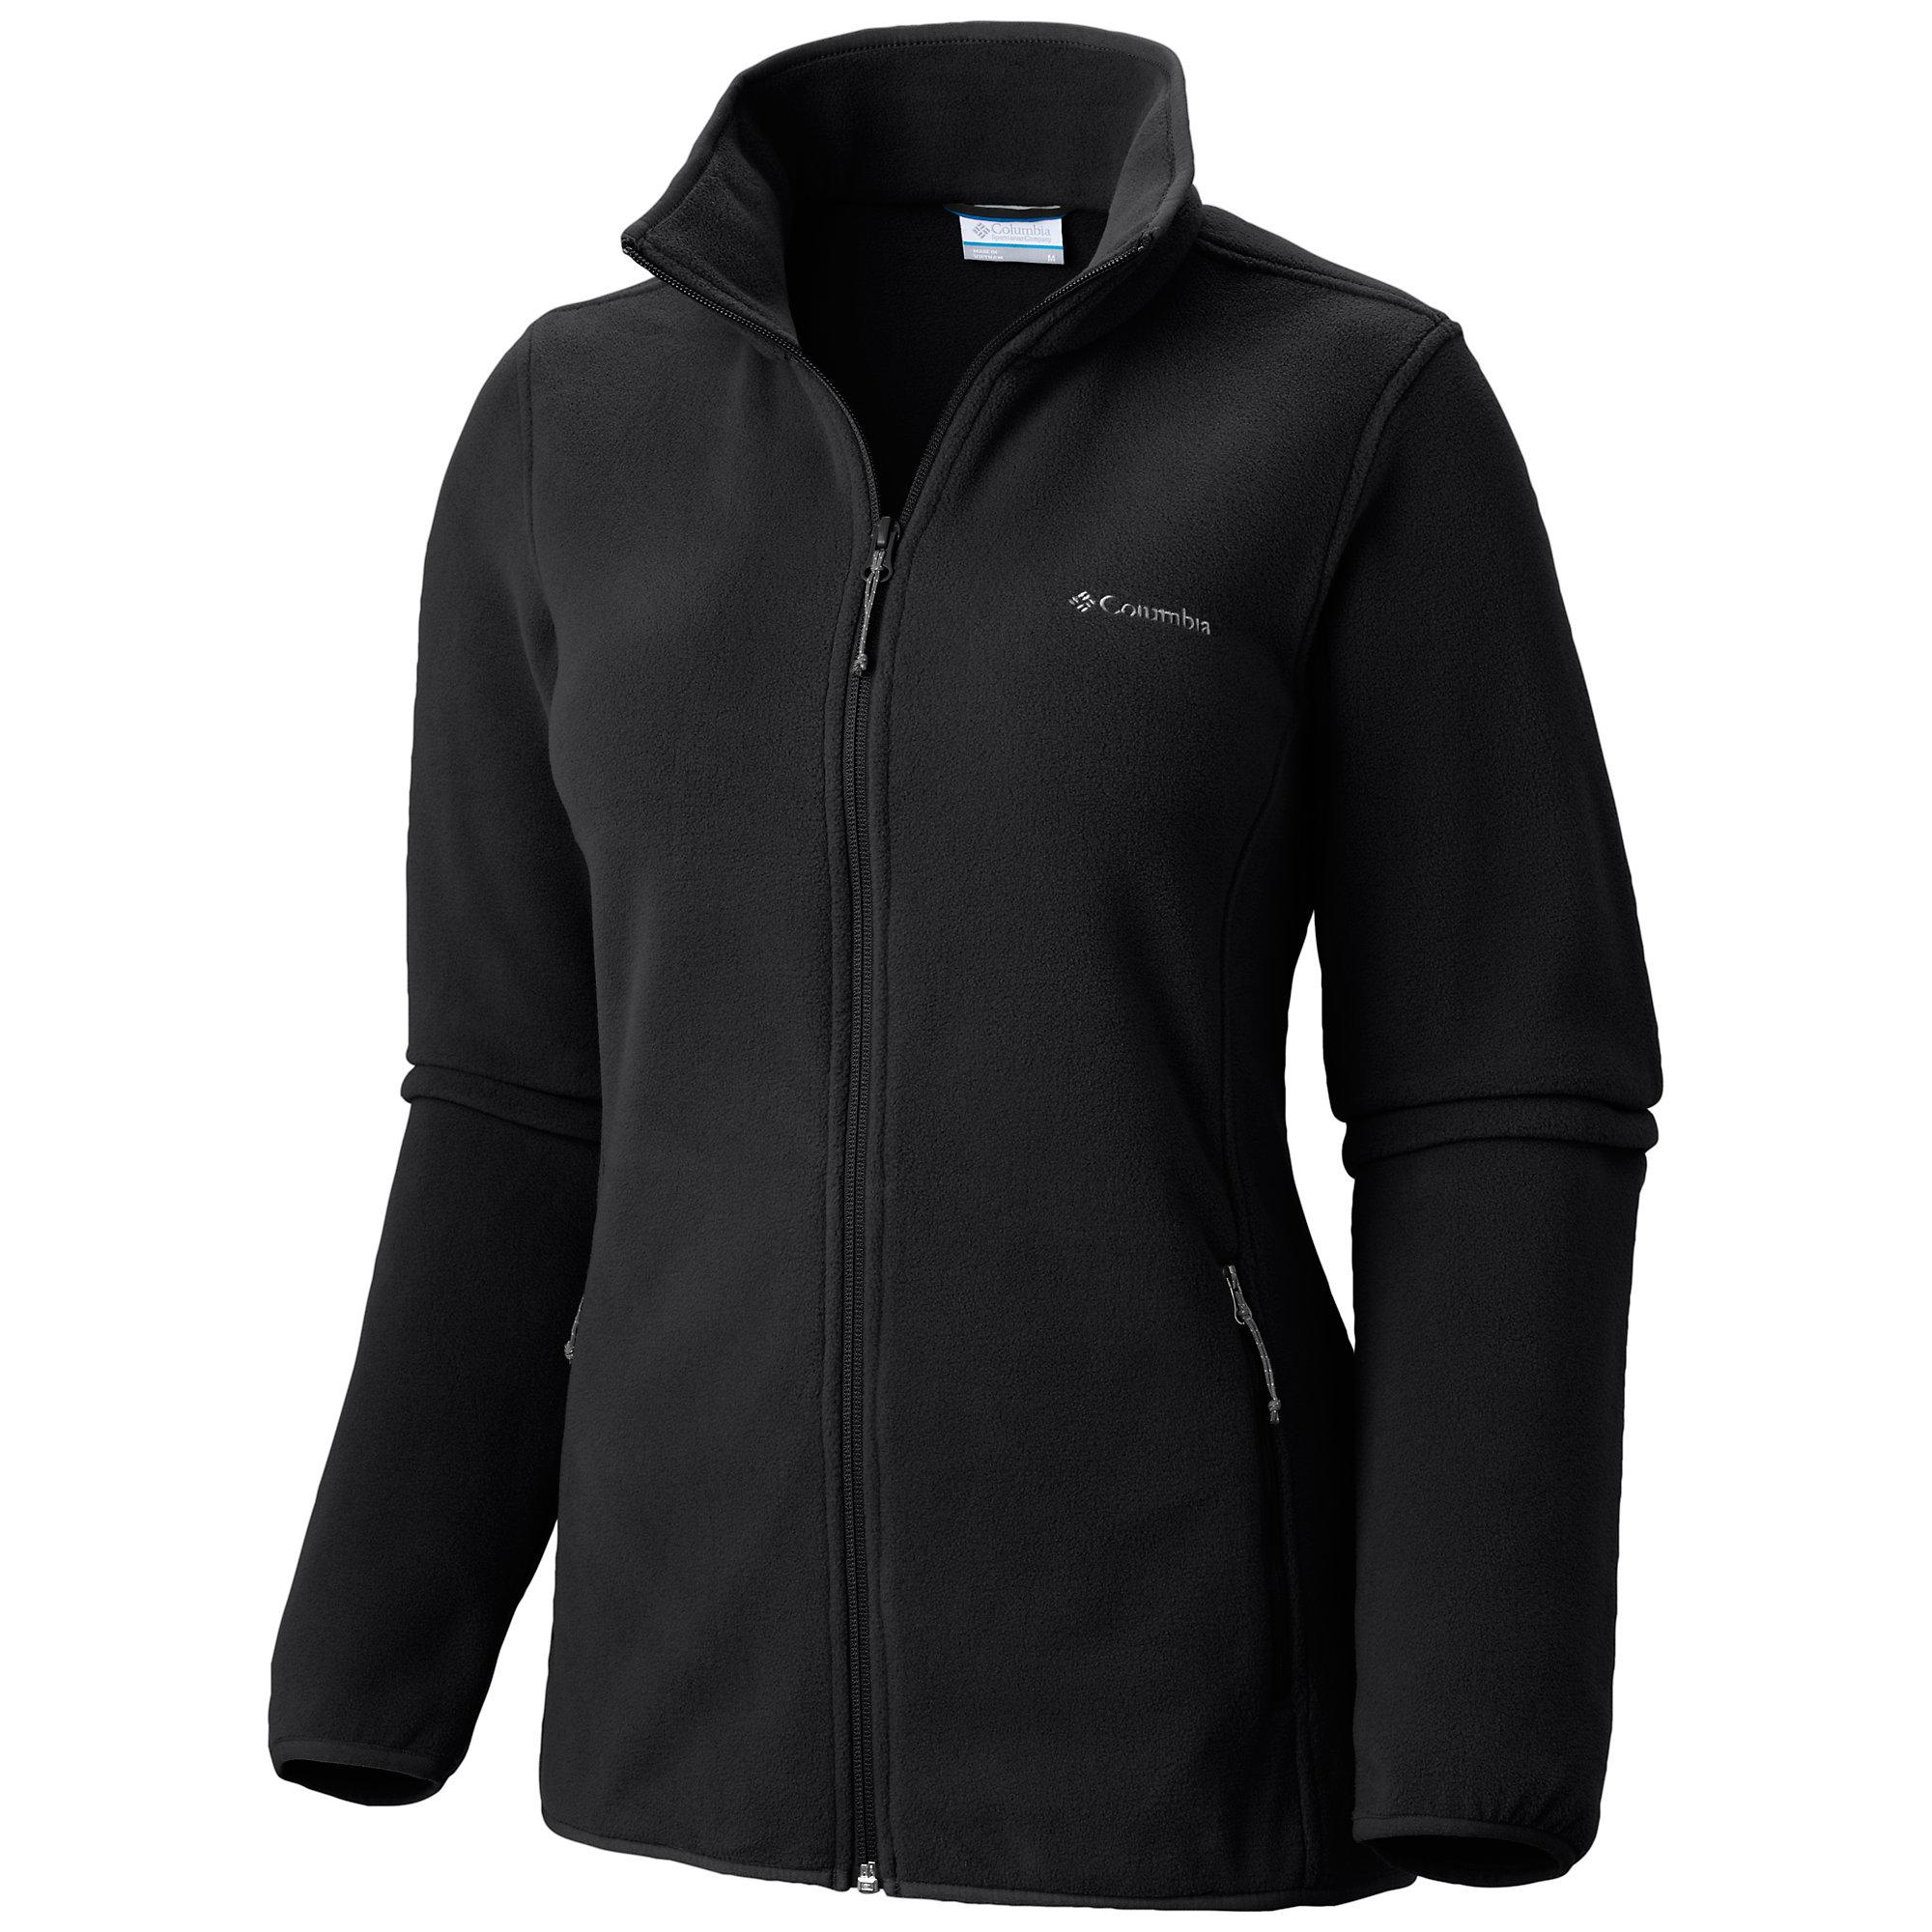 Columbia Fuller Ridge Jacket